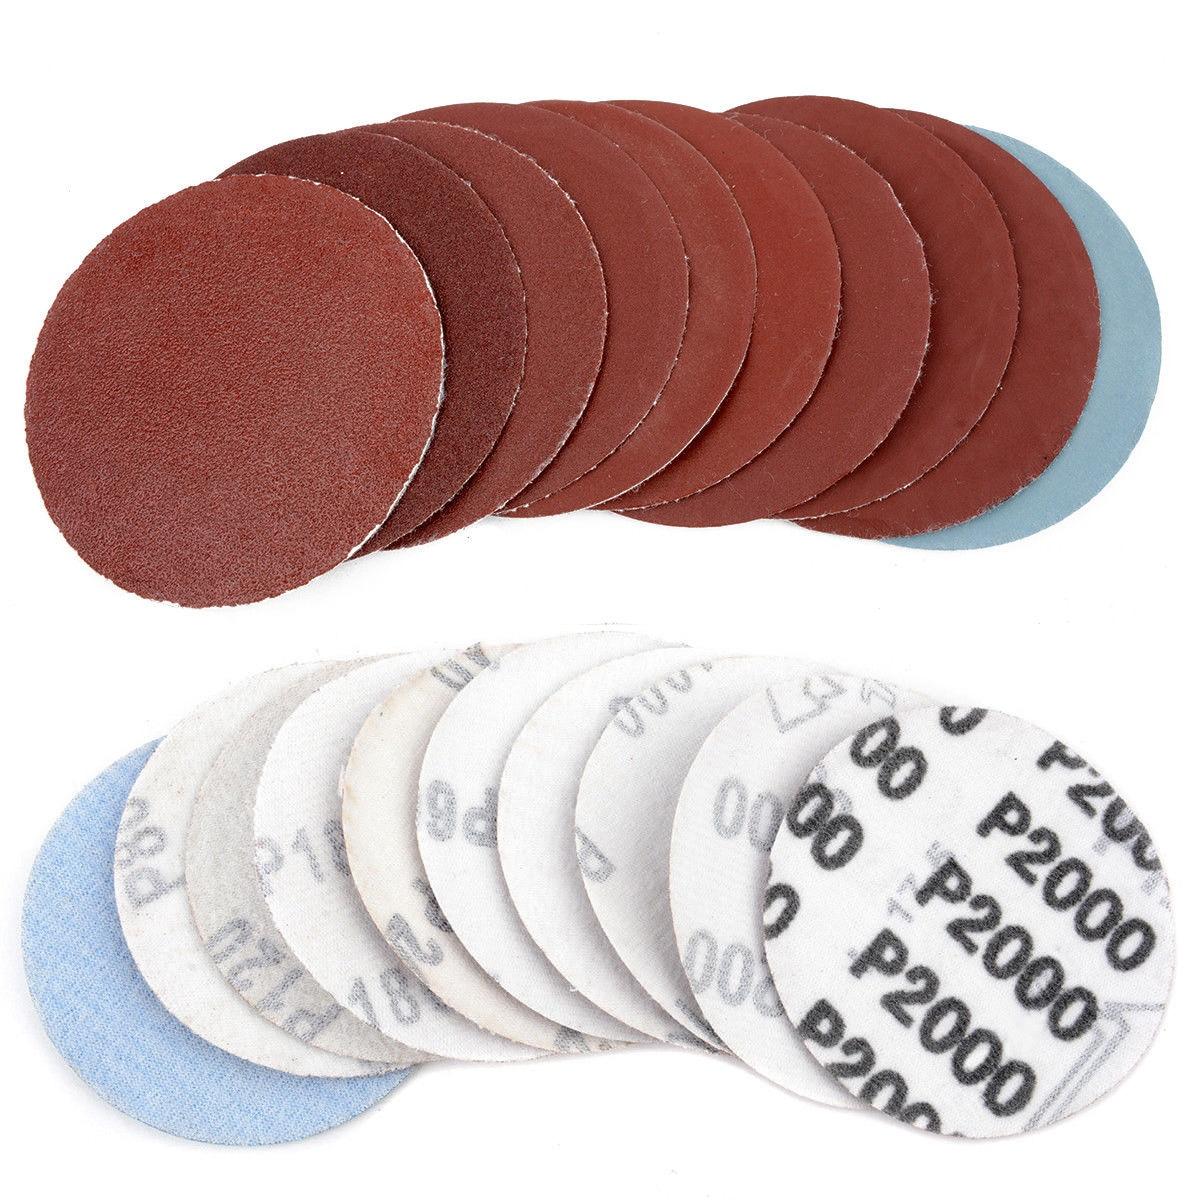 High Quality 100pcs/set 3 inches 75mm Mixed Sander Disc 80~3000 Grit Round Sanding Polishing Pad Sheets Sandpaper цена